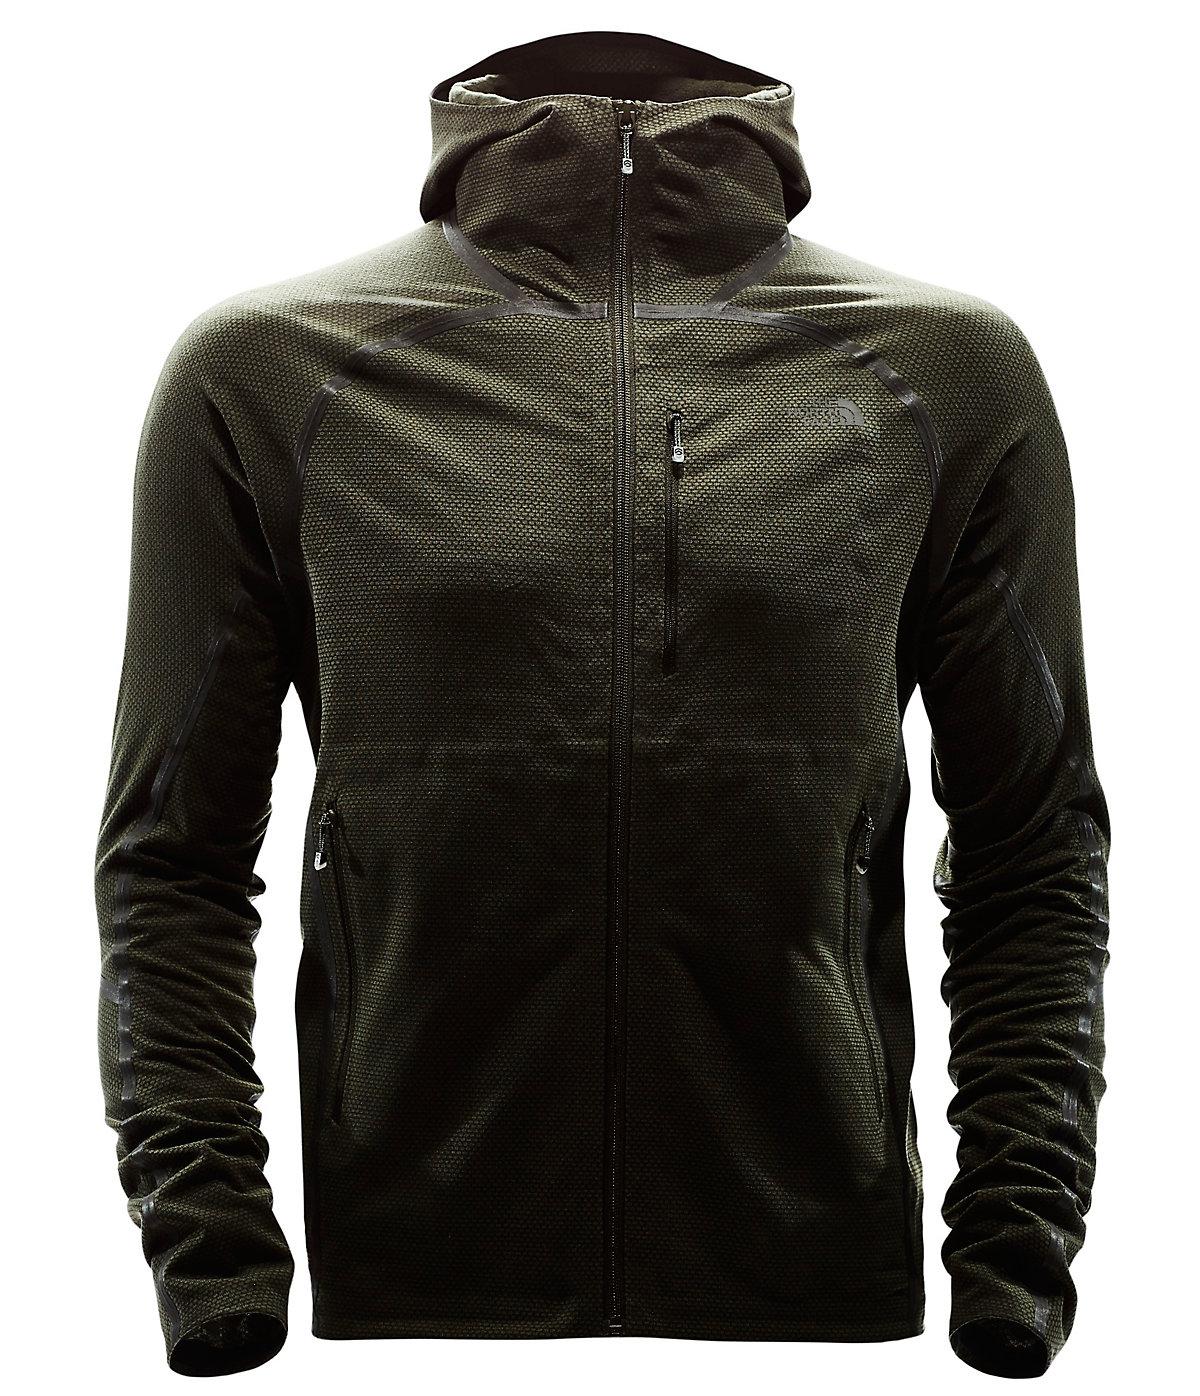 a8e01c52e The North Face Men's Summit L2 Fleece Mid-Layer Jacket